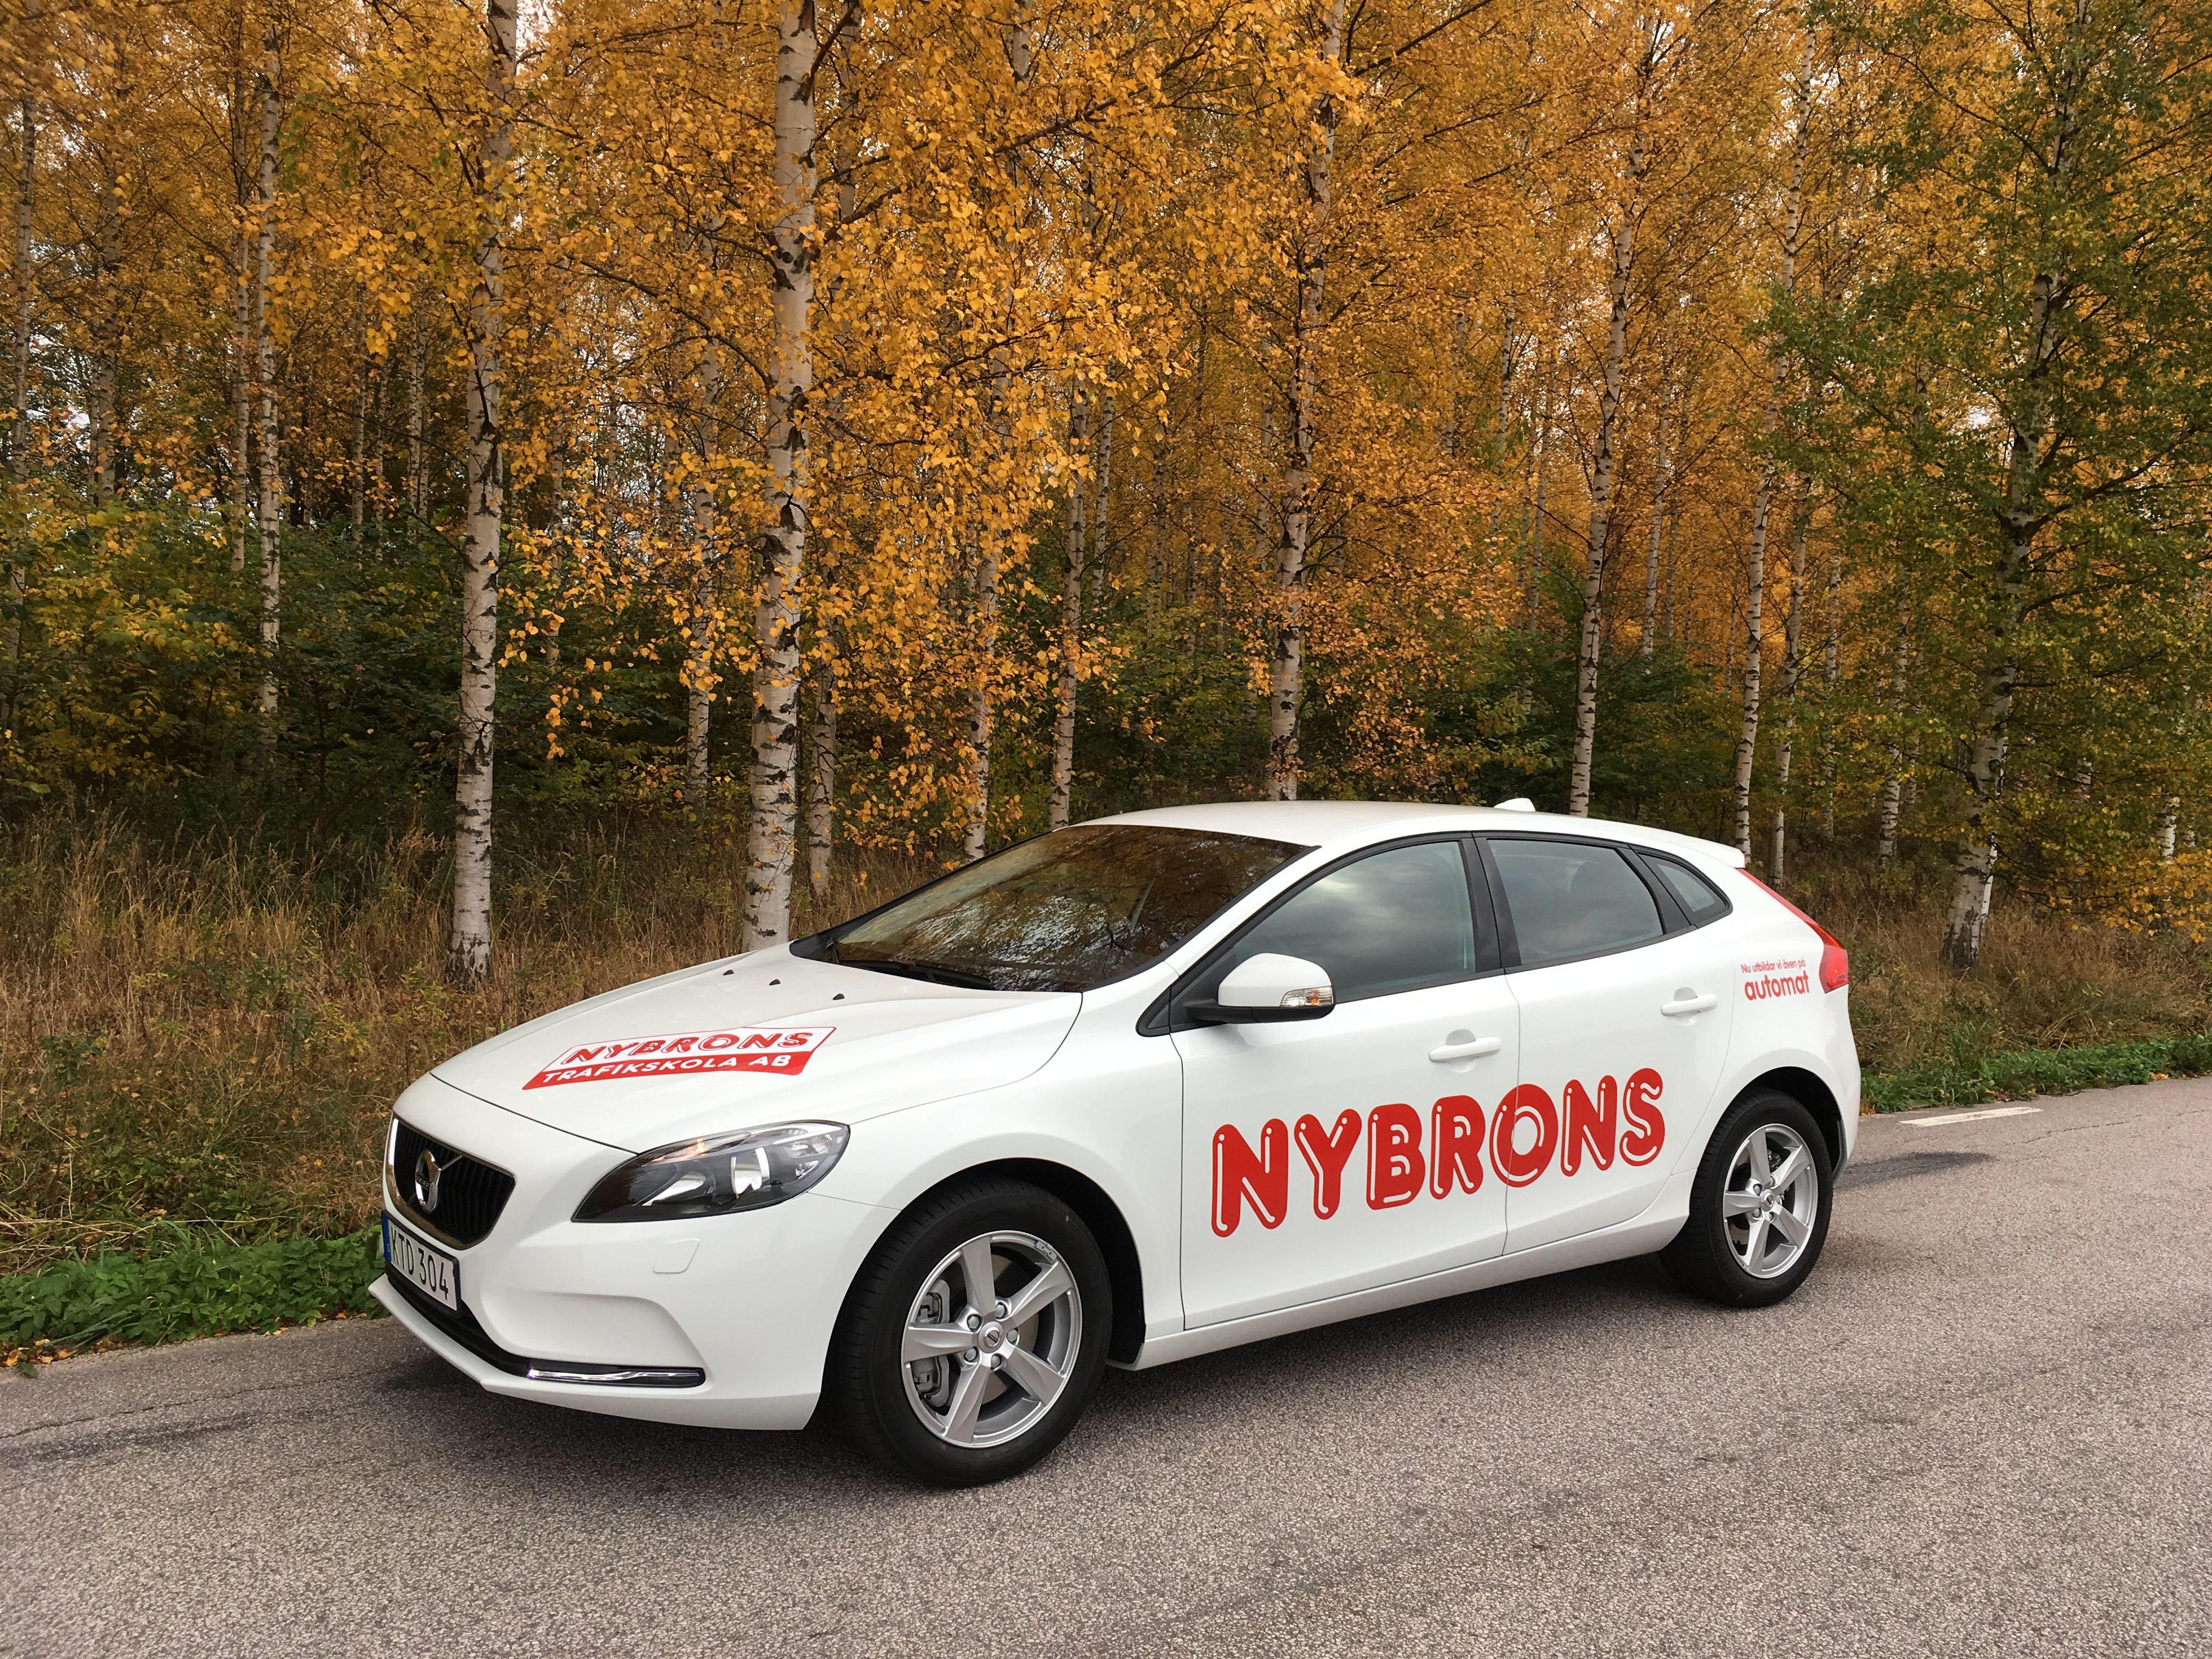 Nybrons Trafikskola AB